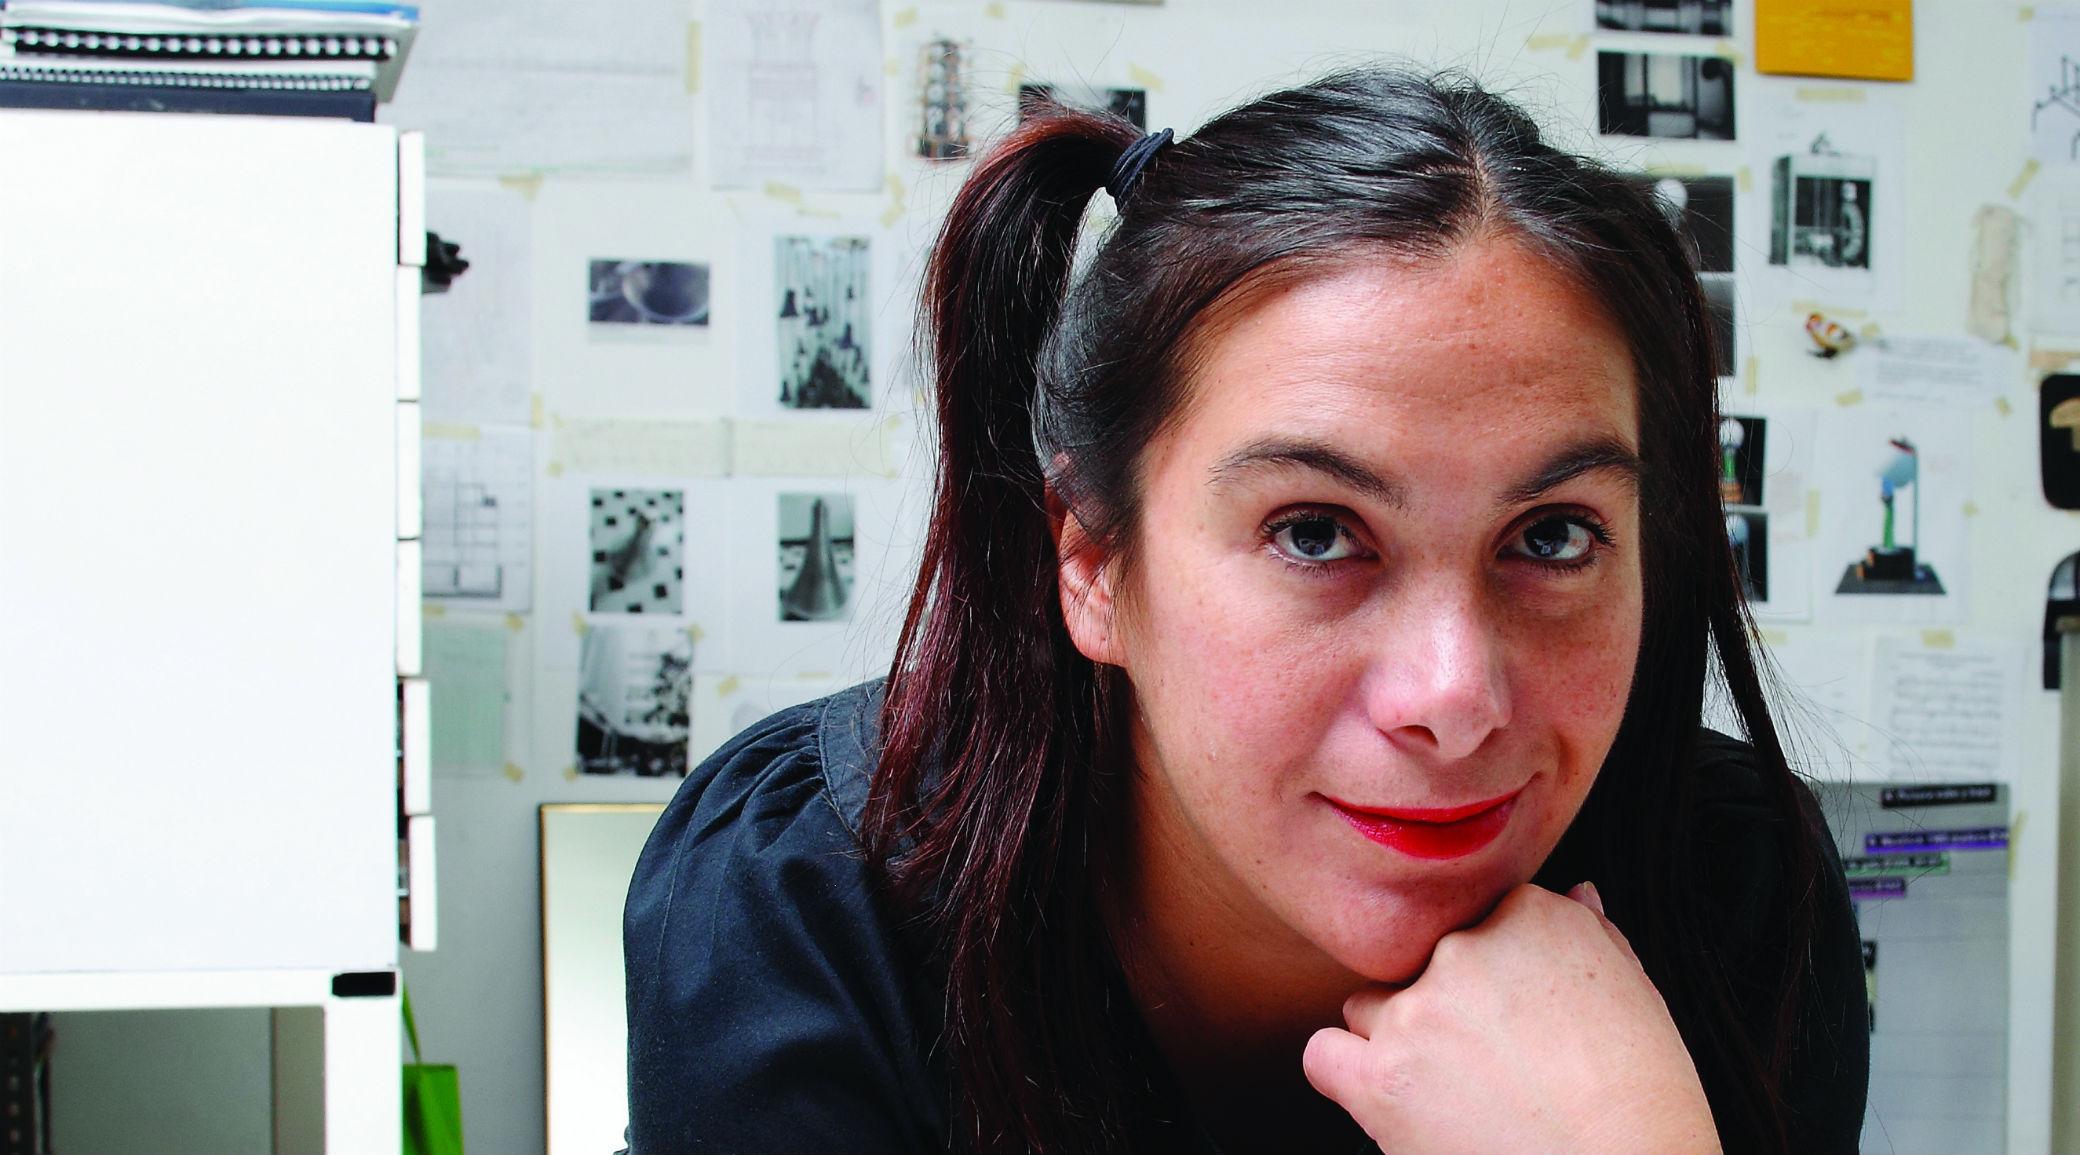 Tania Candiani